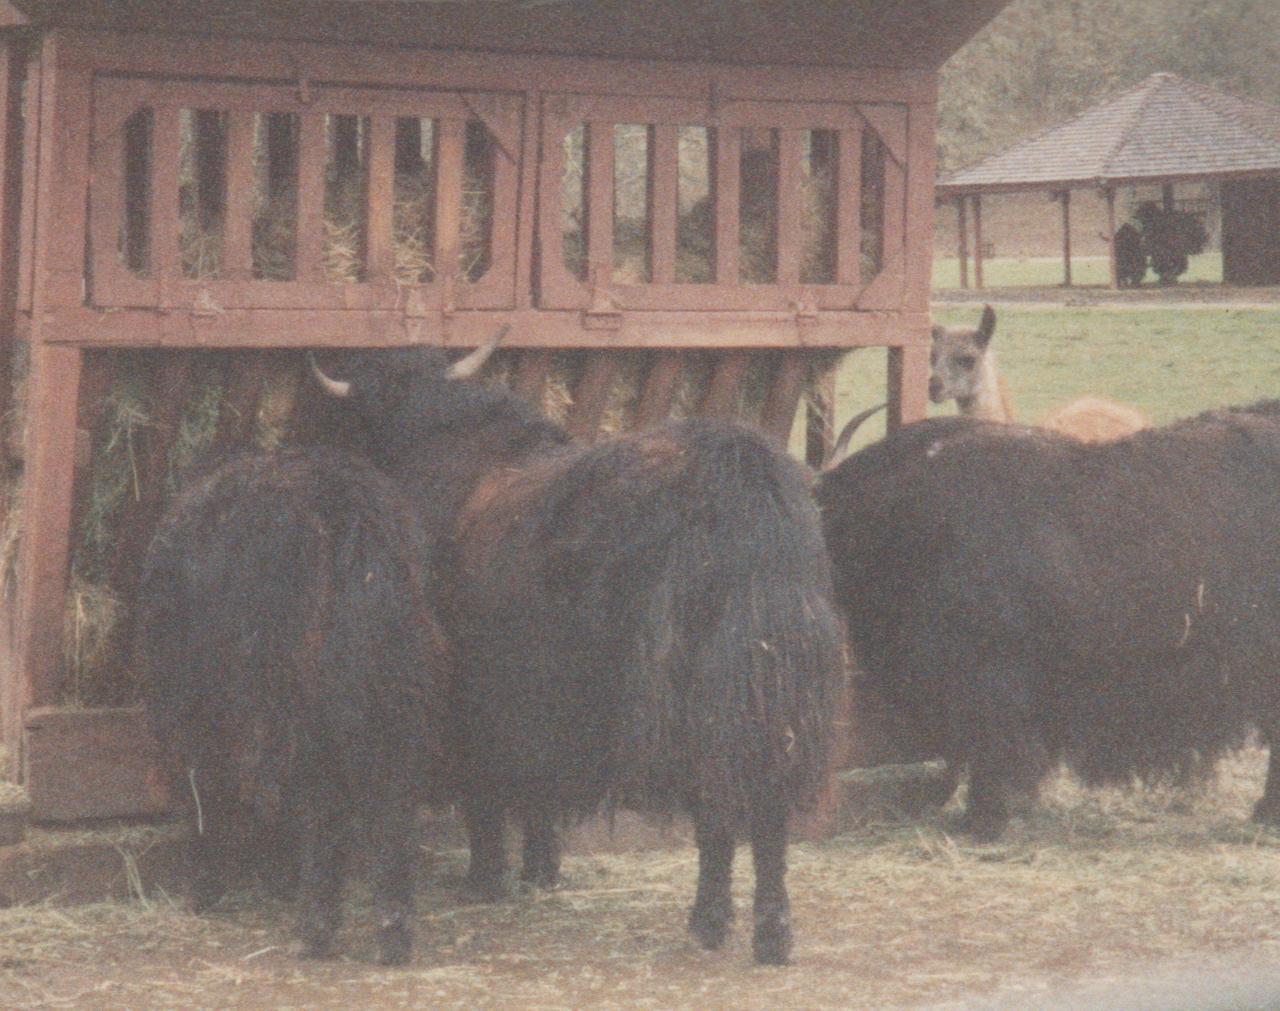 1992-12-26 - Saturday - Wildlife Safari Trip, Marilyn, Crystal-13.png